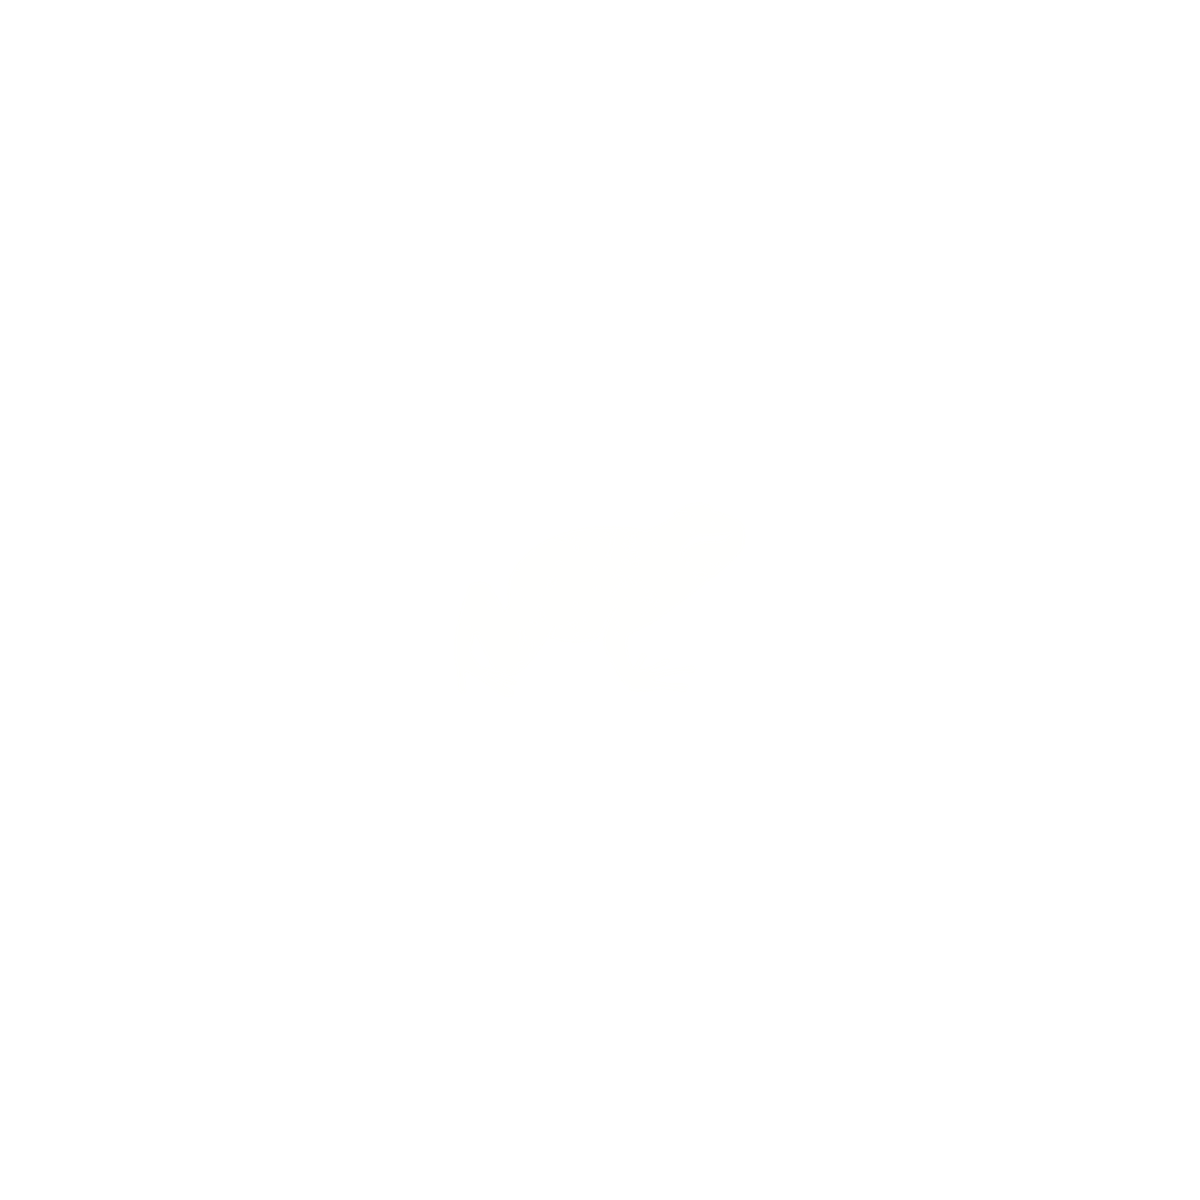 2 New Animals and Buffalo Modifcation for Mountain Buffalo